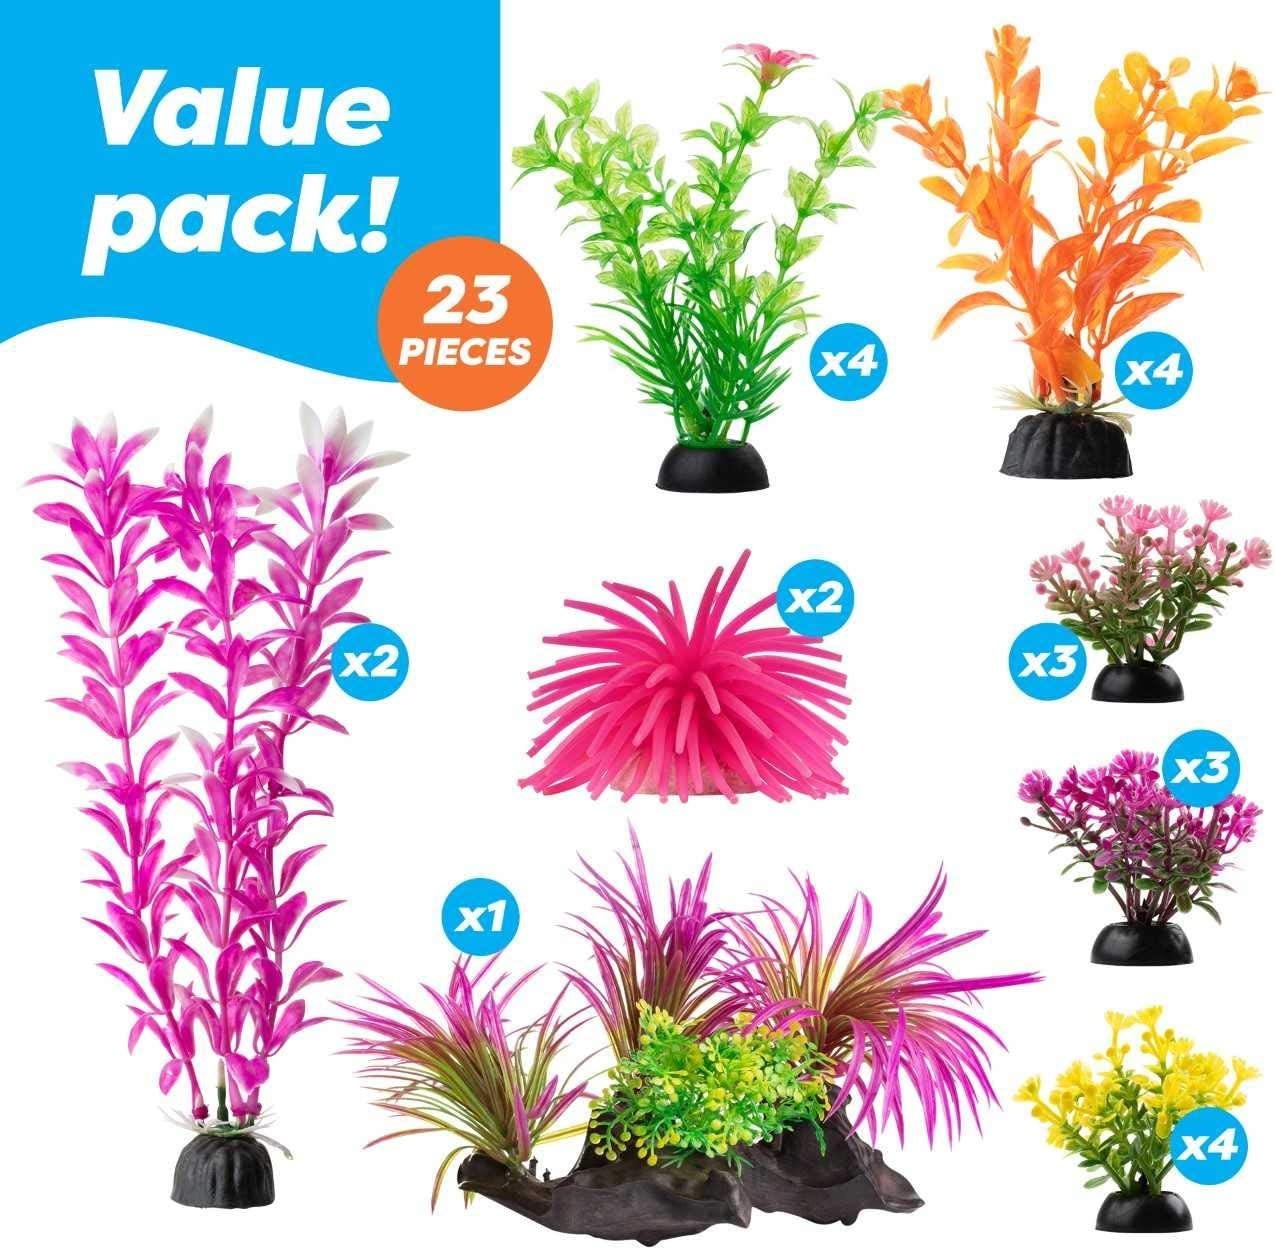 Aropaw Aquarium Decorations 20 30 Pack Lifelike Plastic Decor Fish Tank Plants Small To Large